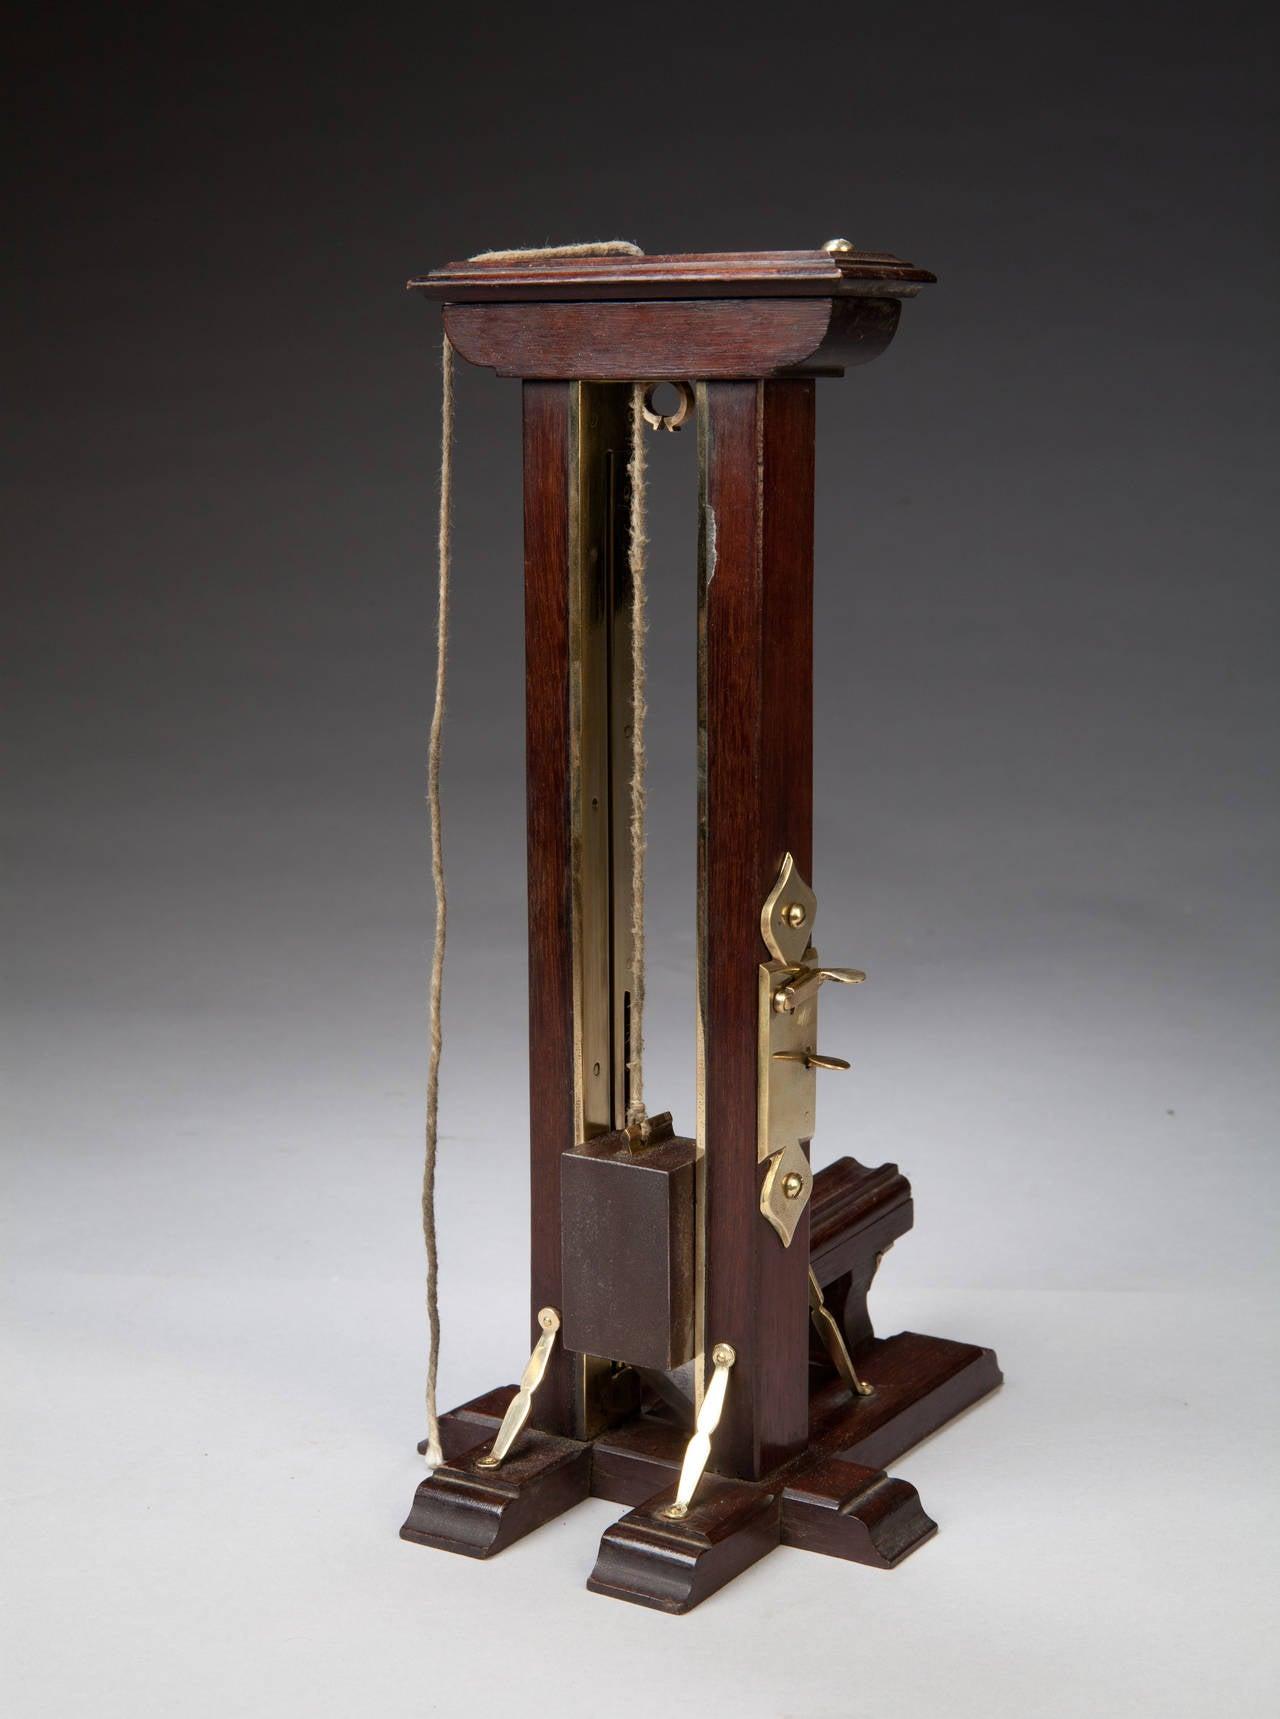 Ile du Diable Prisoner of War Mahogany and Brass Cigar Cutter For Sale 1